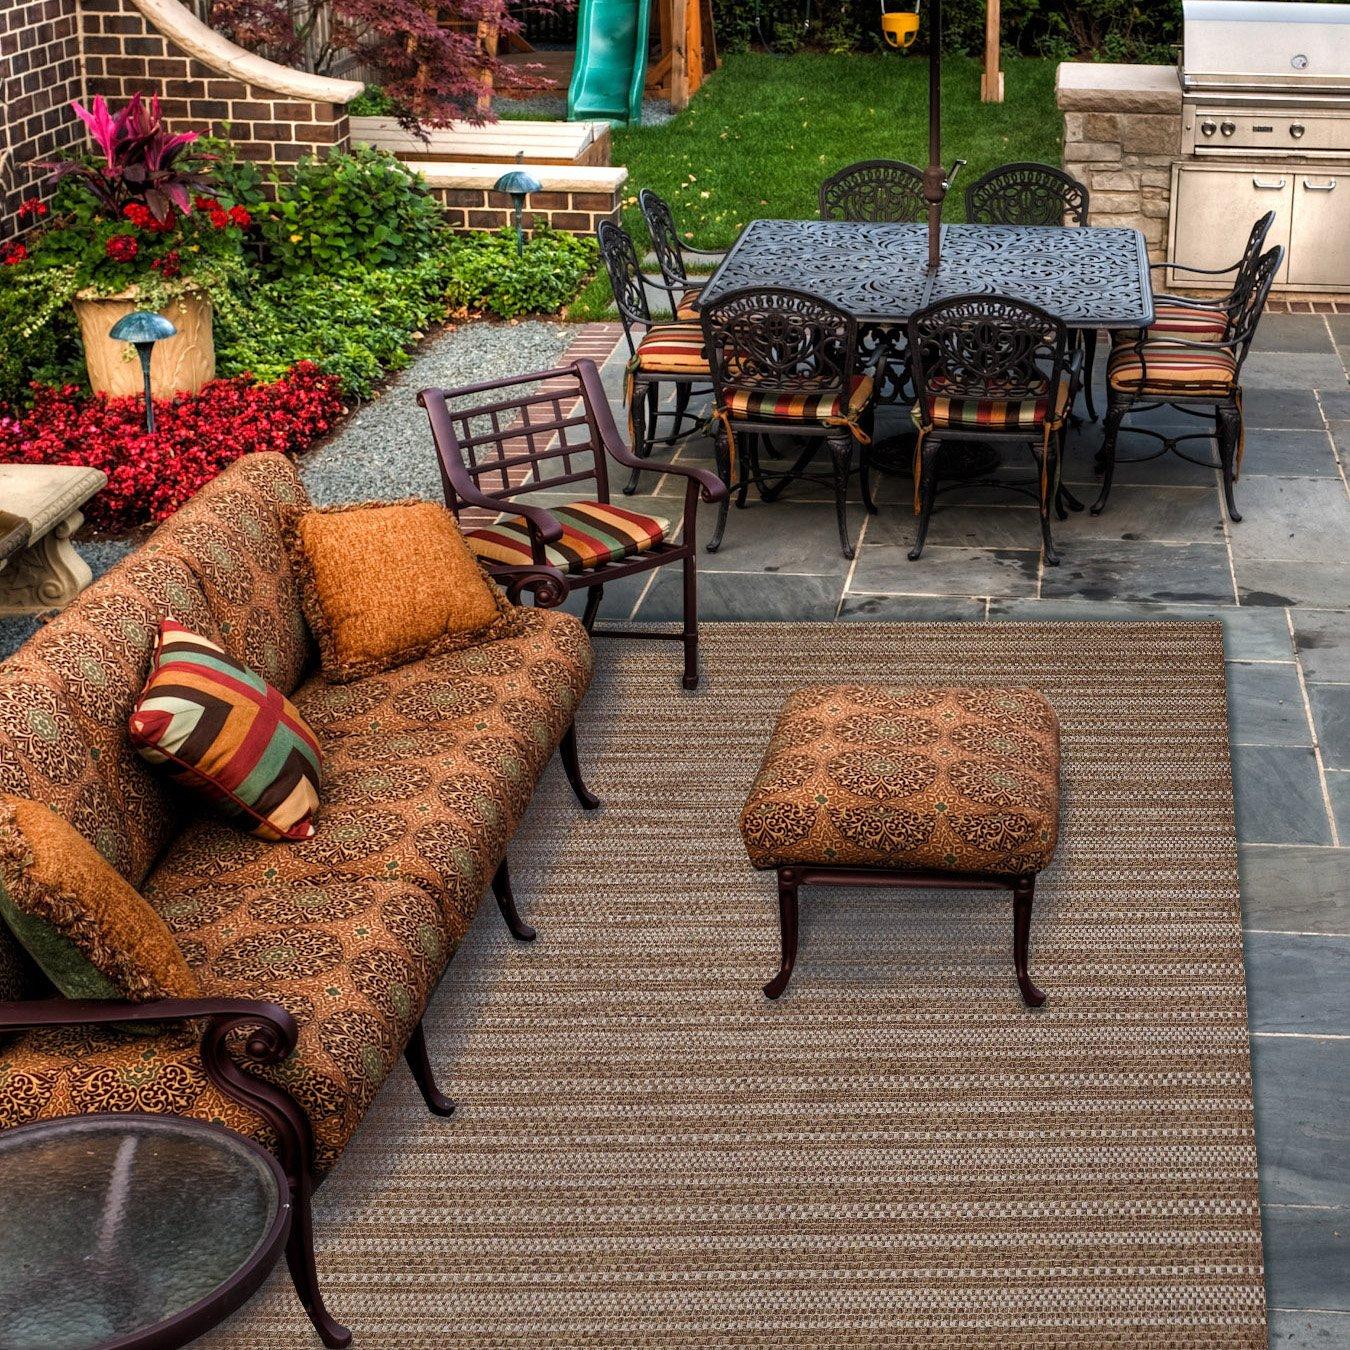 Gertmenian Brown Jordan Prime Label Outdoor Furniture Rug 8x10 Barnwell Collection Sisal Woven Modern Patio Rugs, Raven Dot Brown by Gertmenian